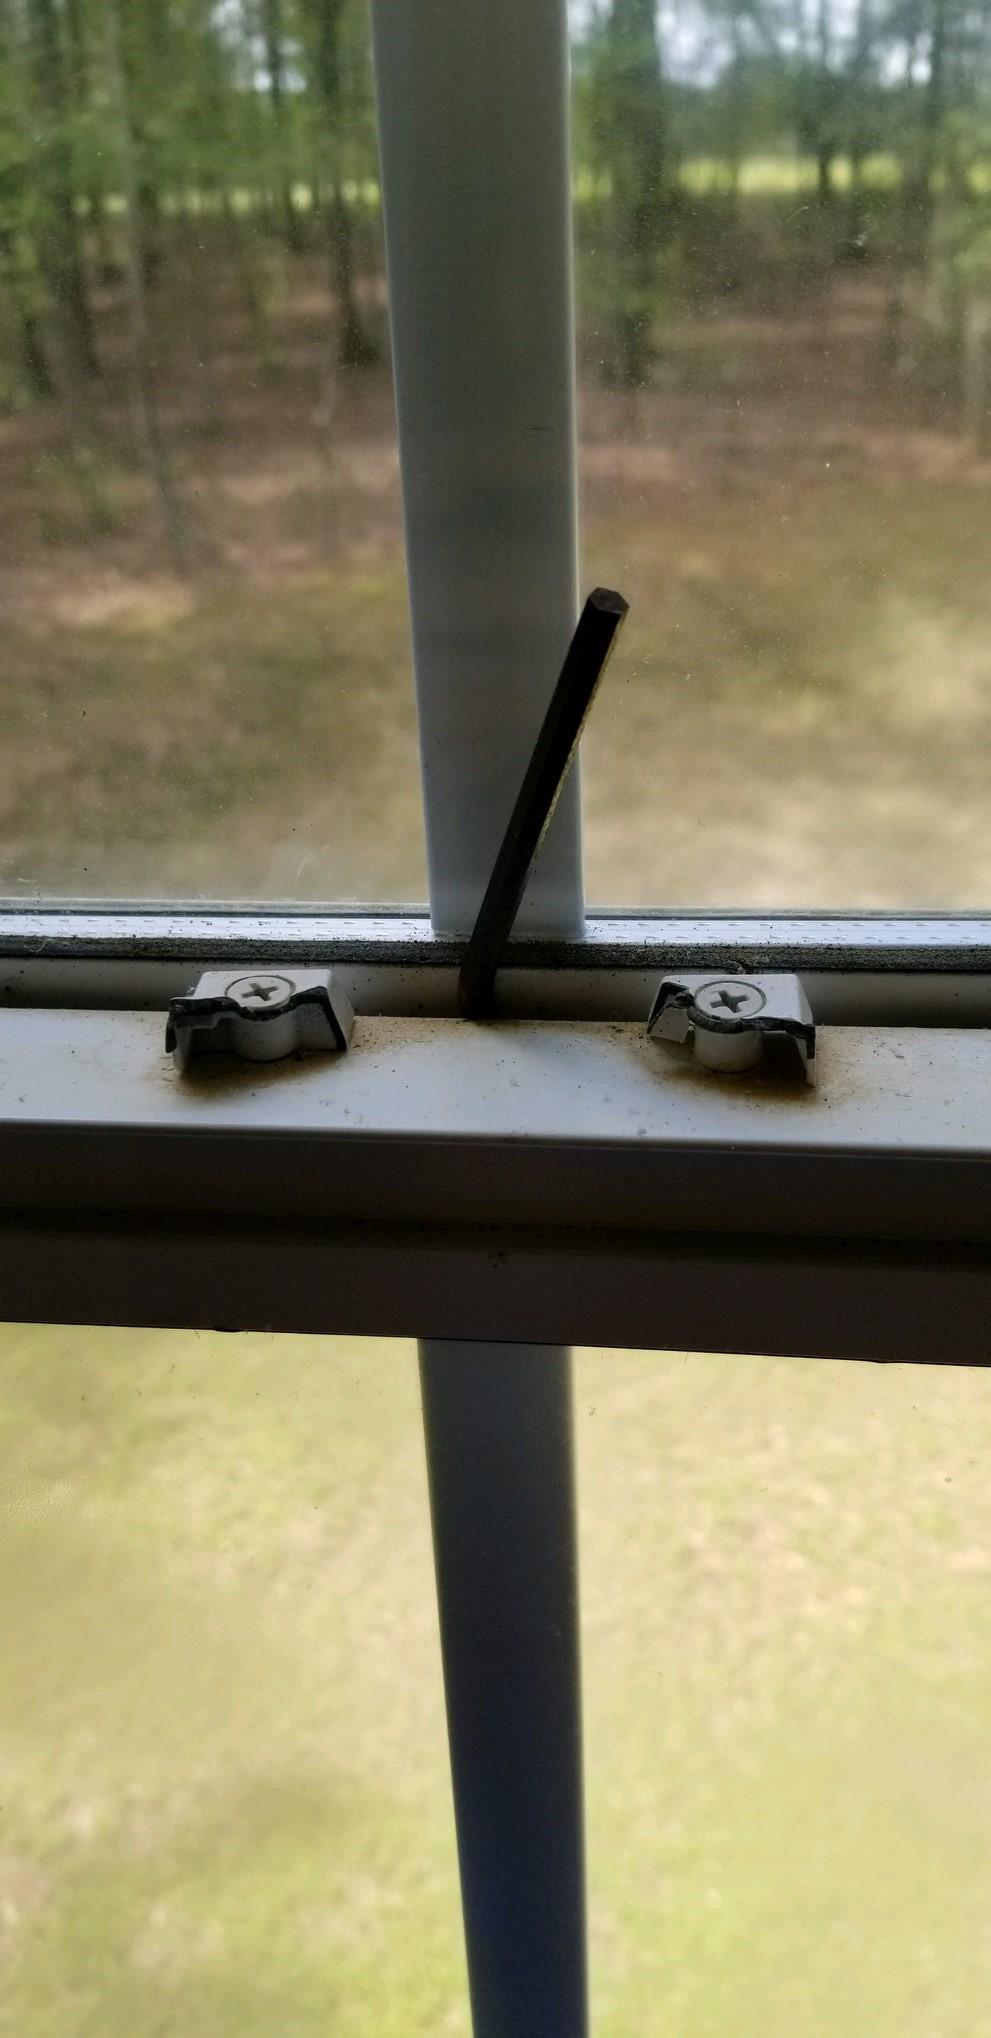 Improper Window Lock - Locust Grove, GA